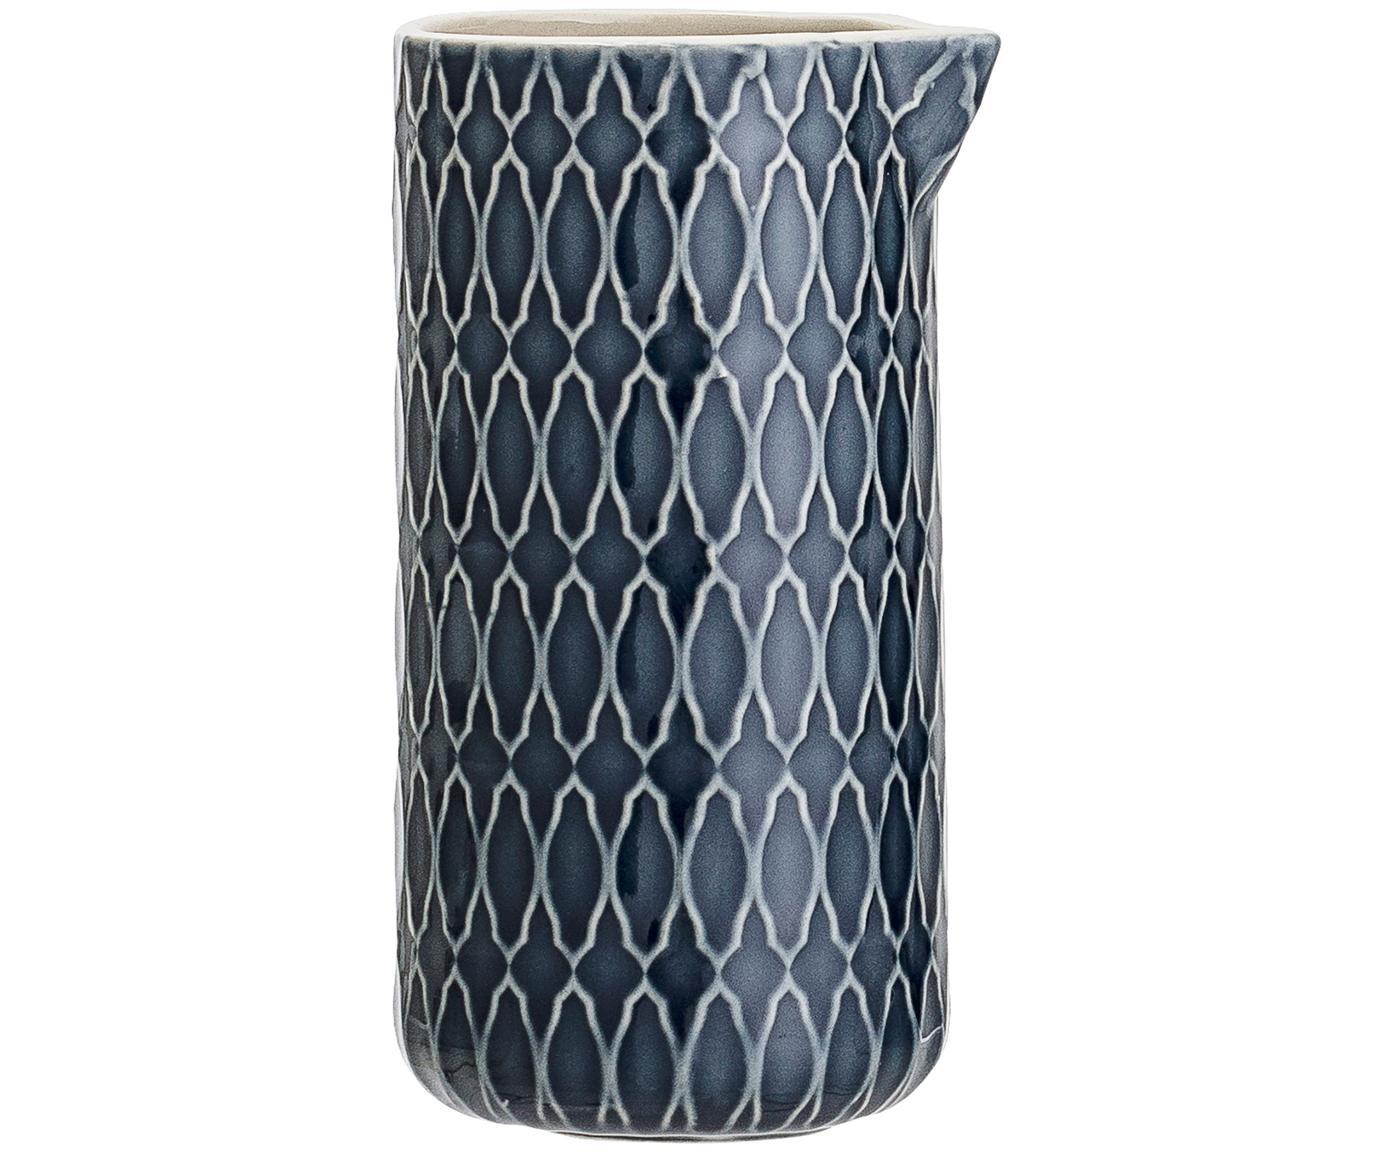 Melkkan Naomi, Keramiek, Blauw, wit, Ø 6 x H 12 cm